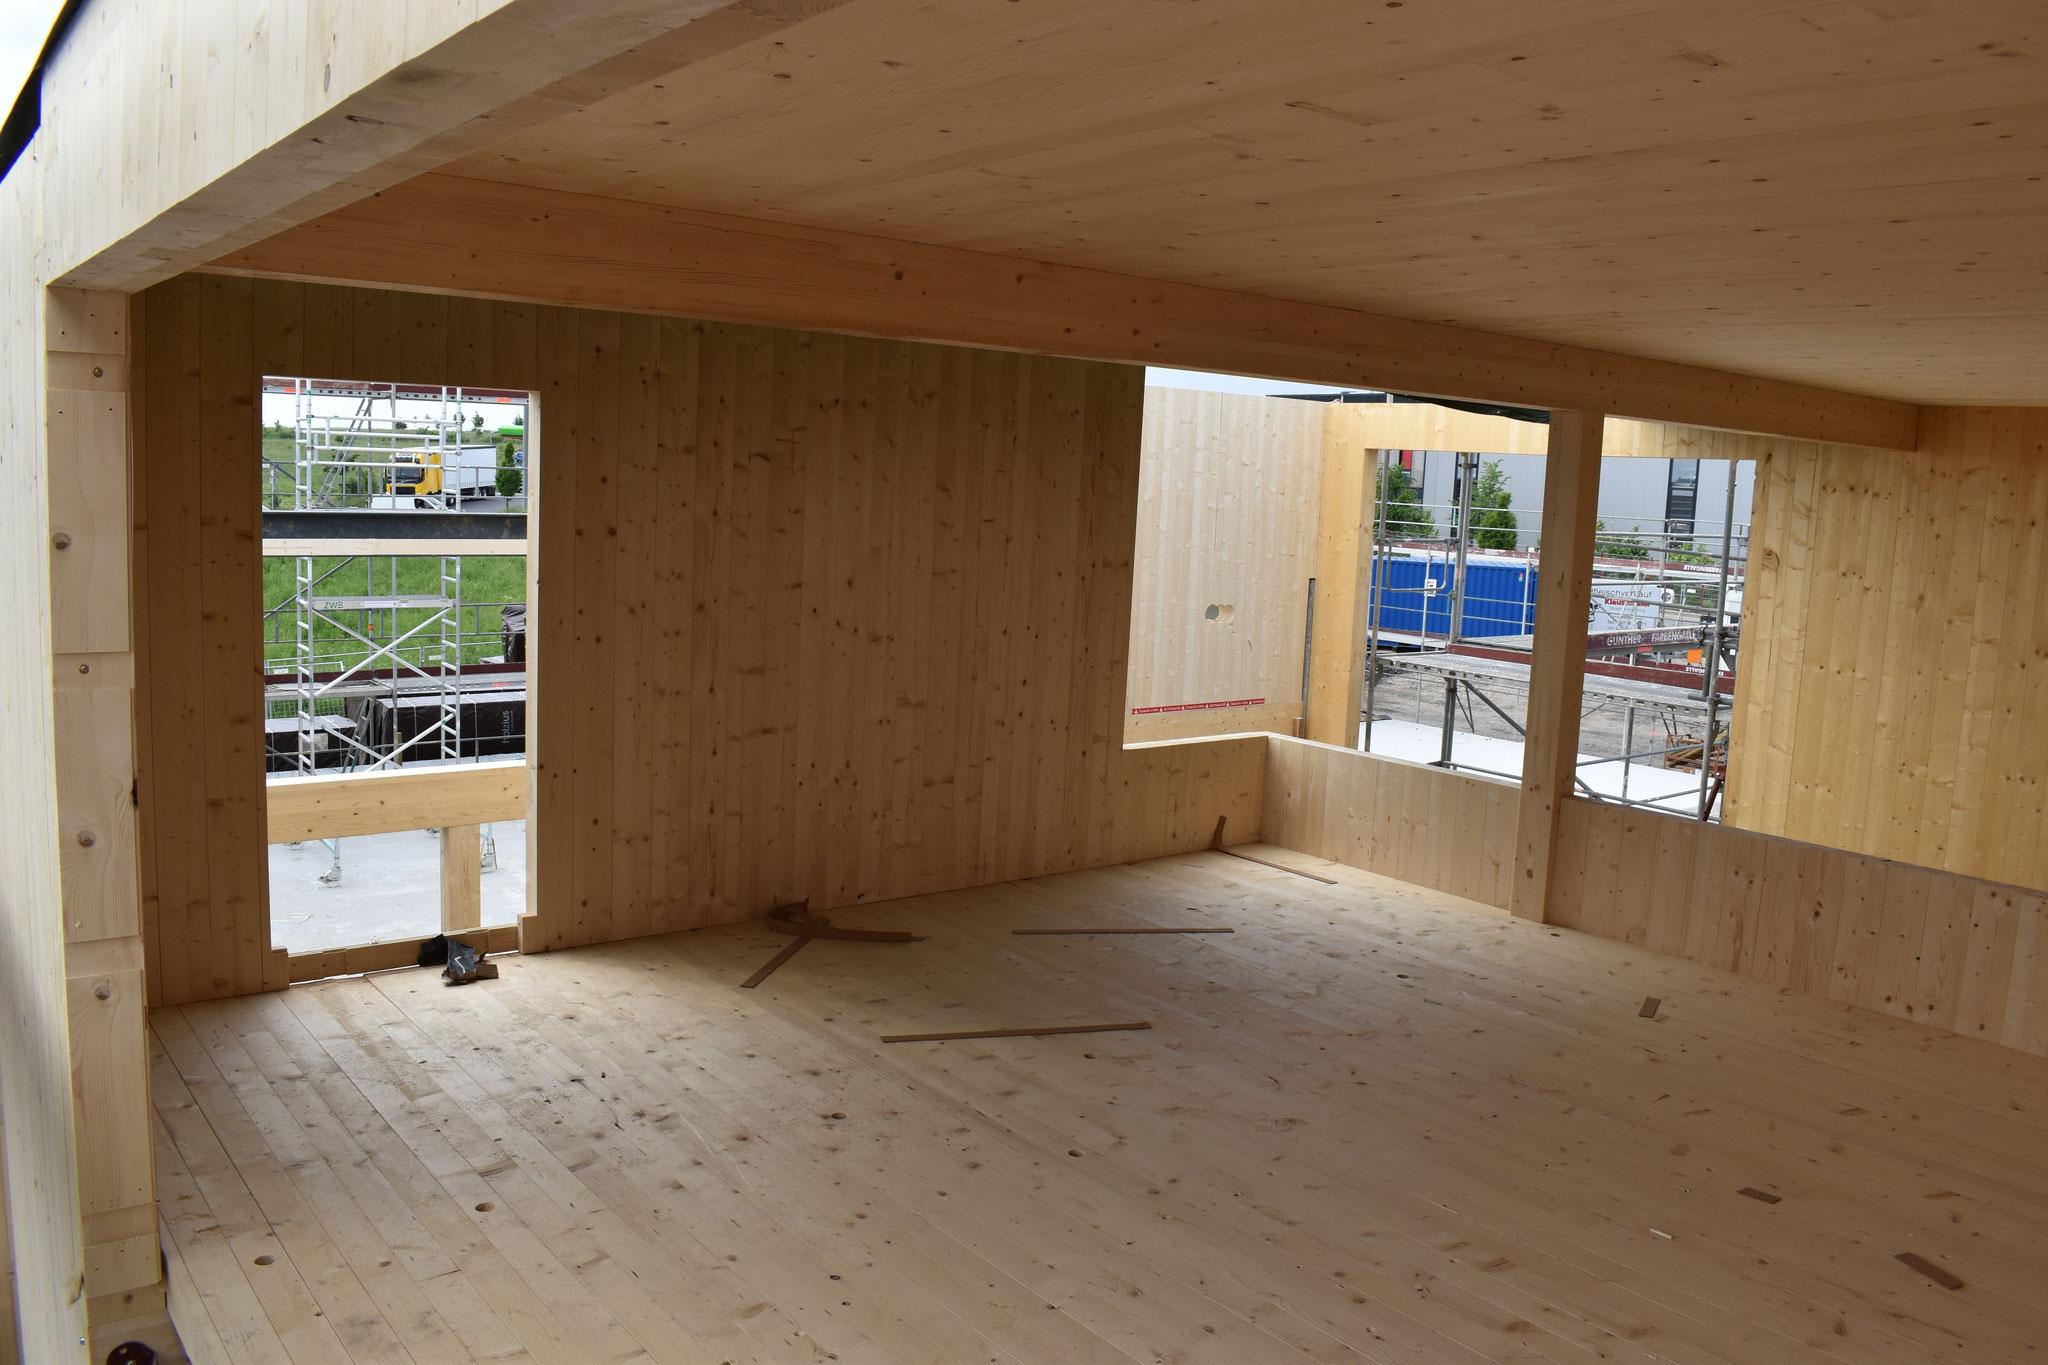 Bauteil 5 - Galerie